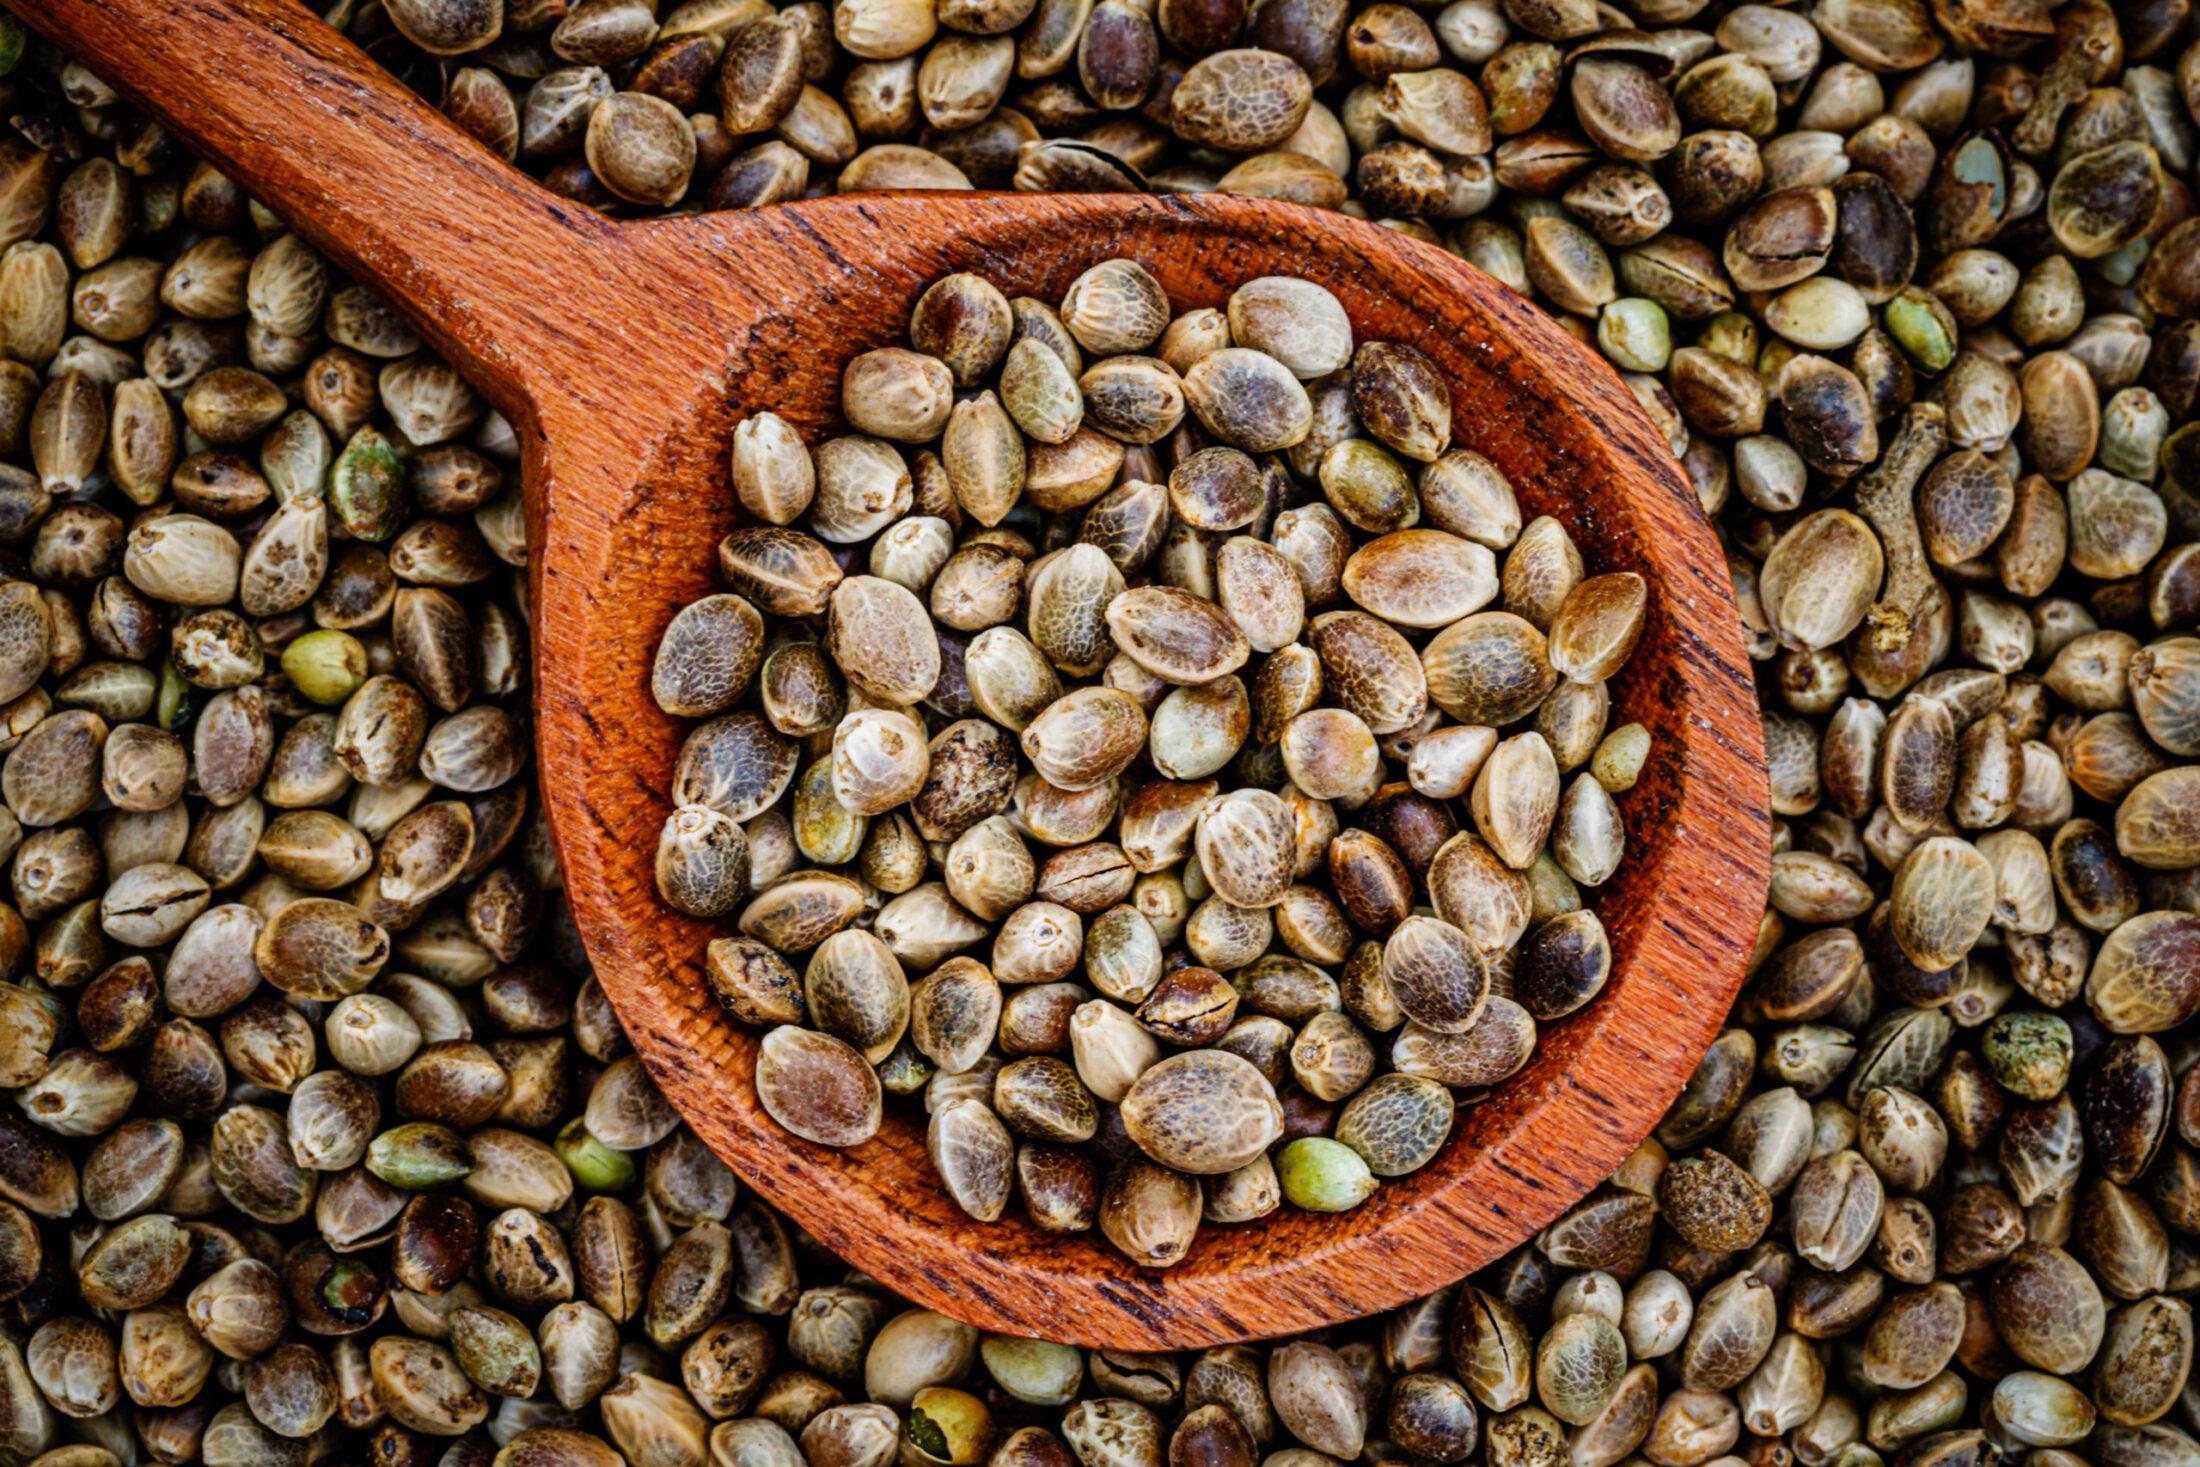 dc weed seeds